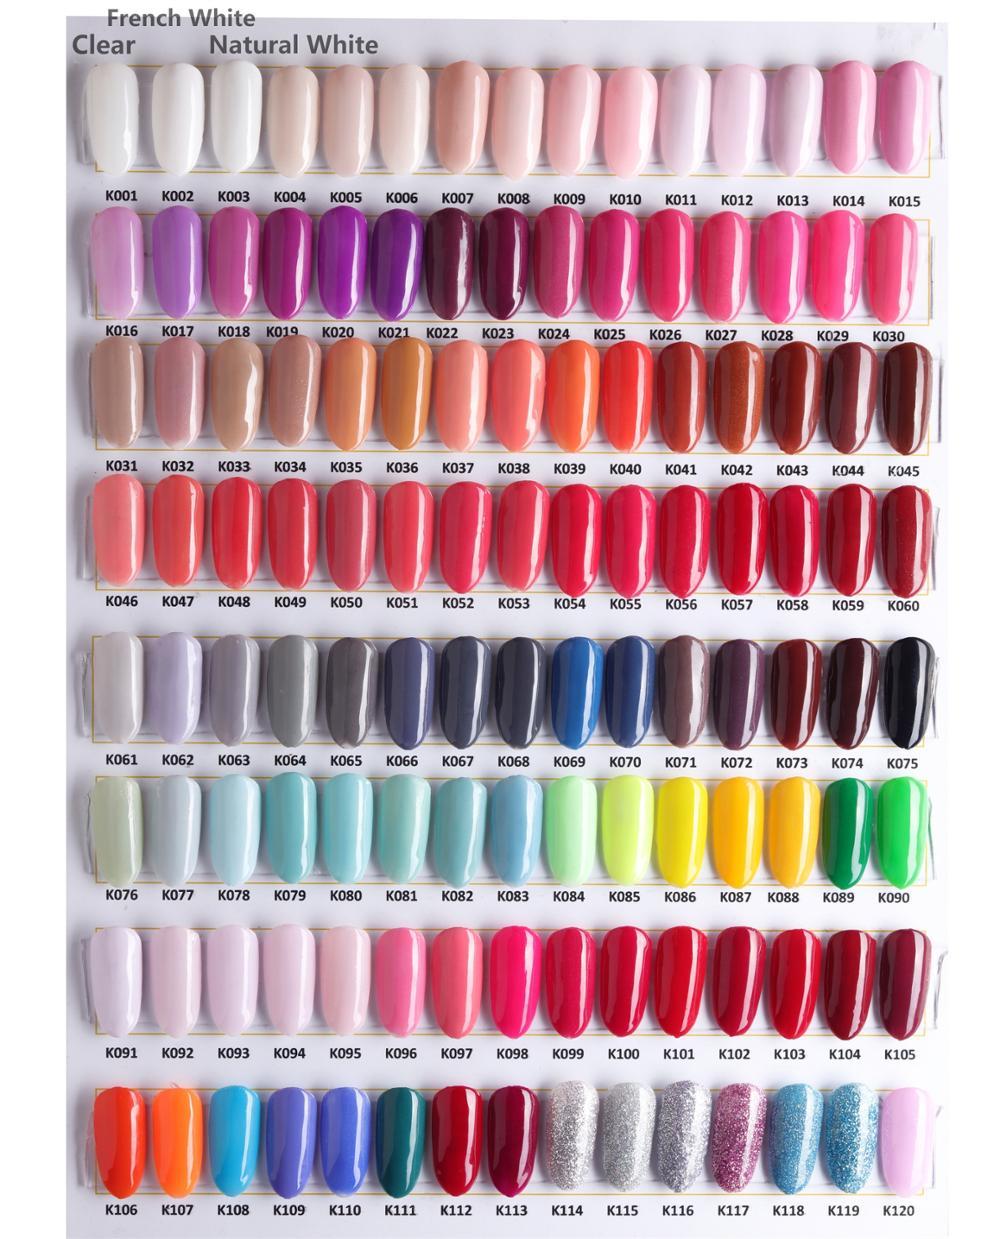 28g Jar 1oz Dip Powder No Lamp Cure Nails Dipping Powders Summer Color Nail Natural Dry For K001 K031 In Glitter From Beauty